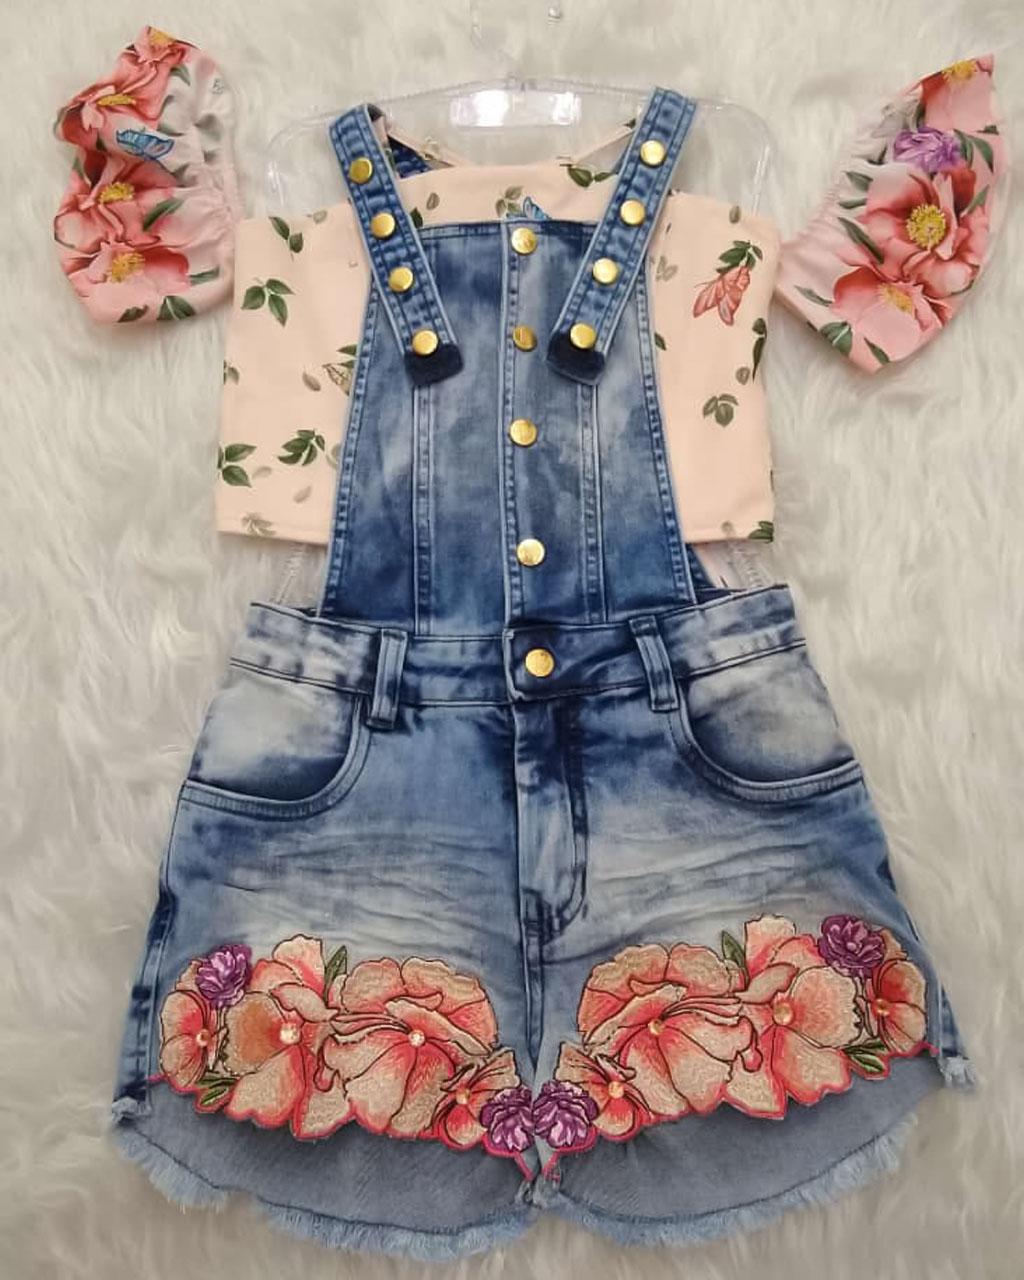 Jardineira Infantil Jeans Bordada com Blusa Cropped Floral Salmão Kukixo